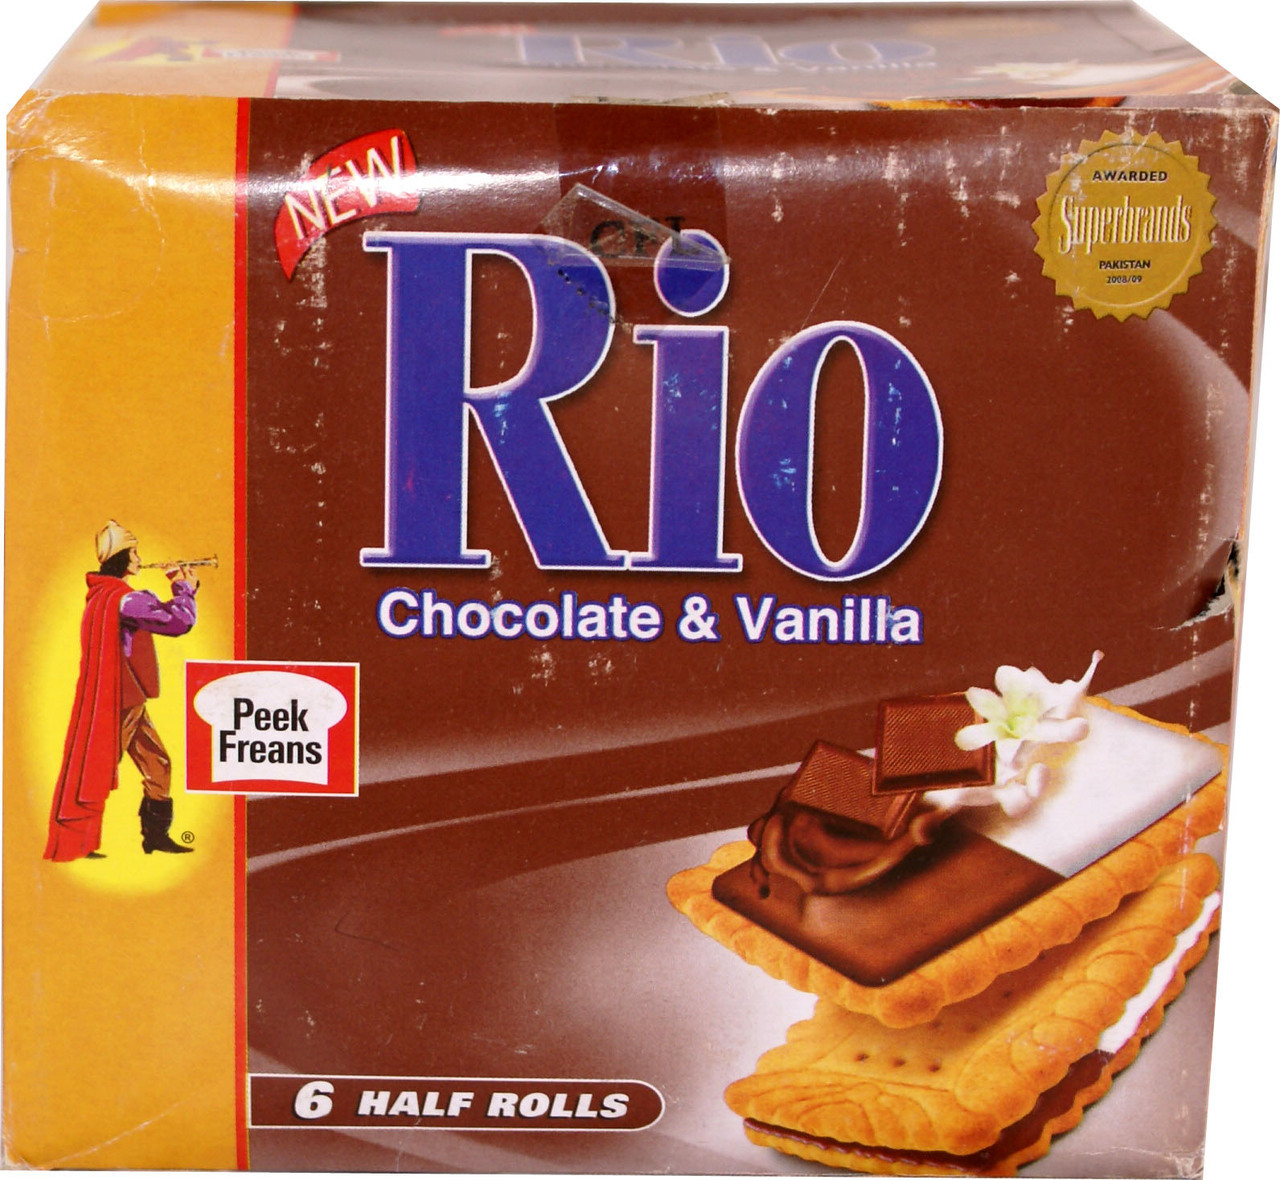 Peek Freans Rio Chocolate 6 Half Roll Box Snacks Chips